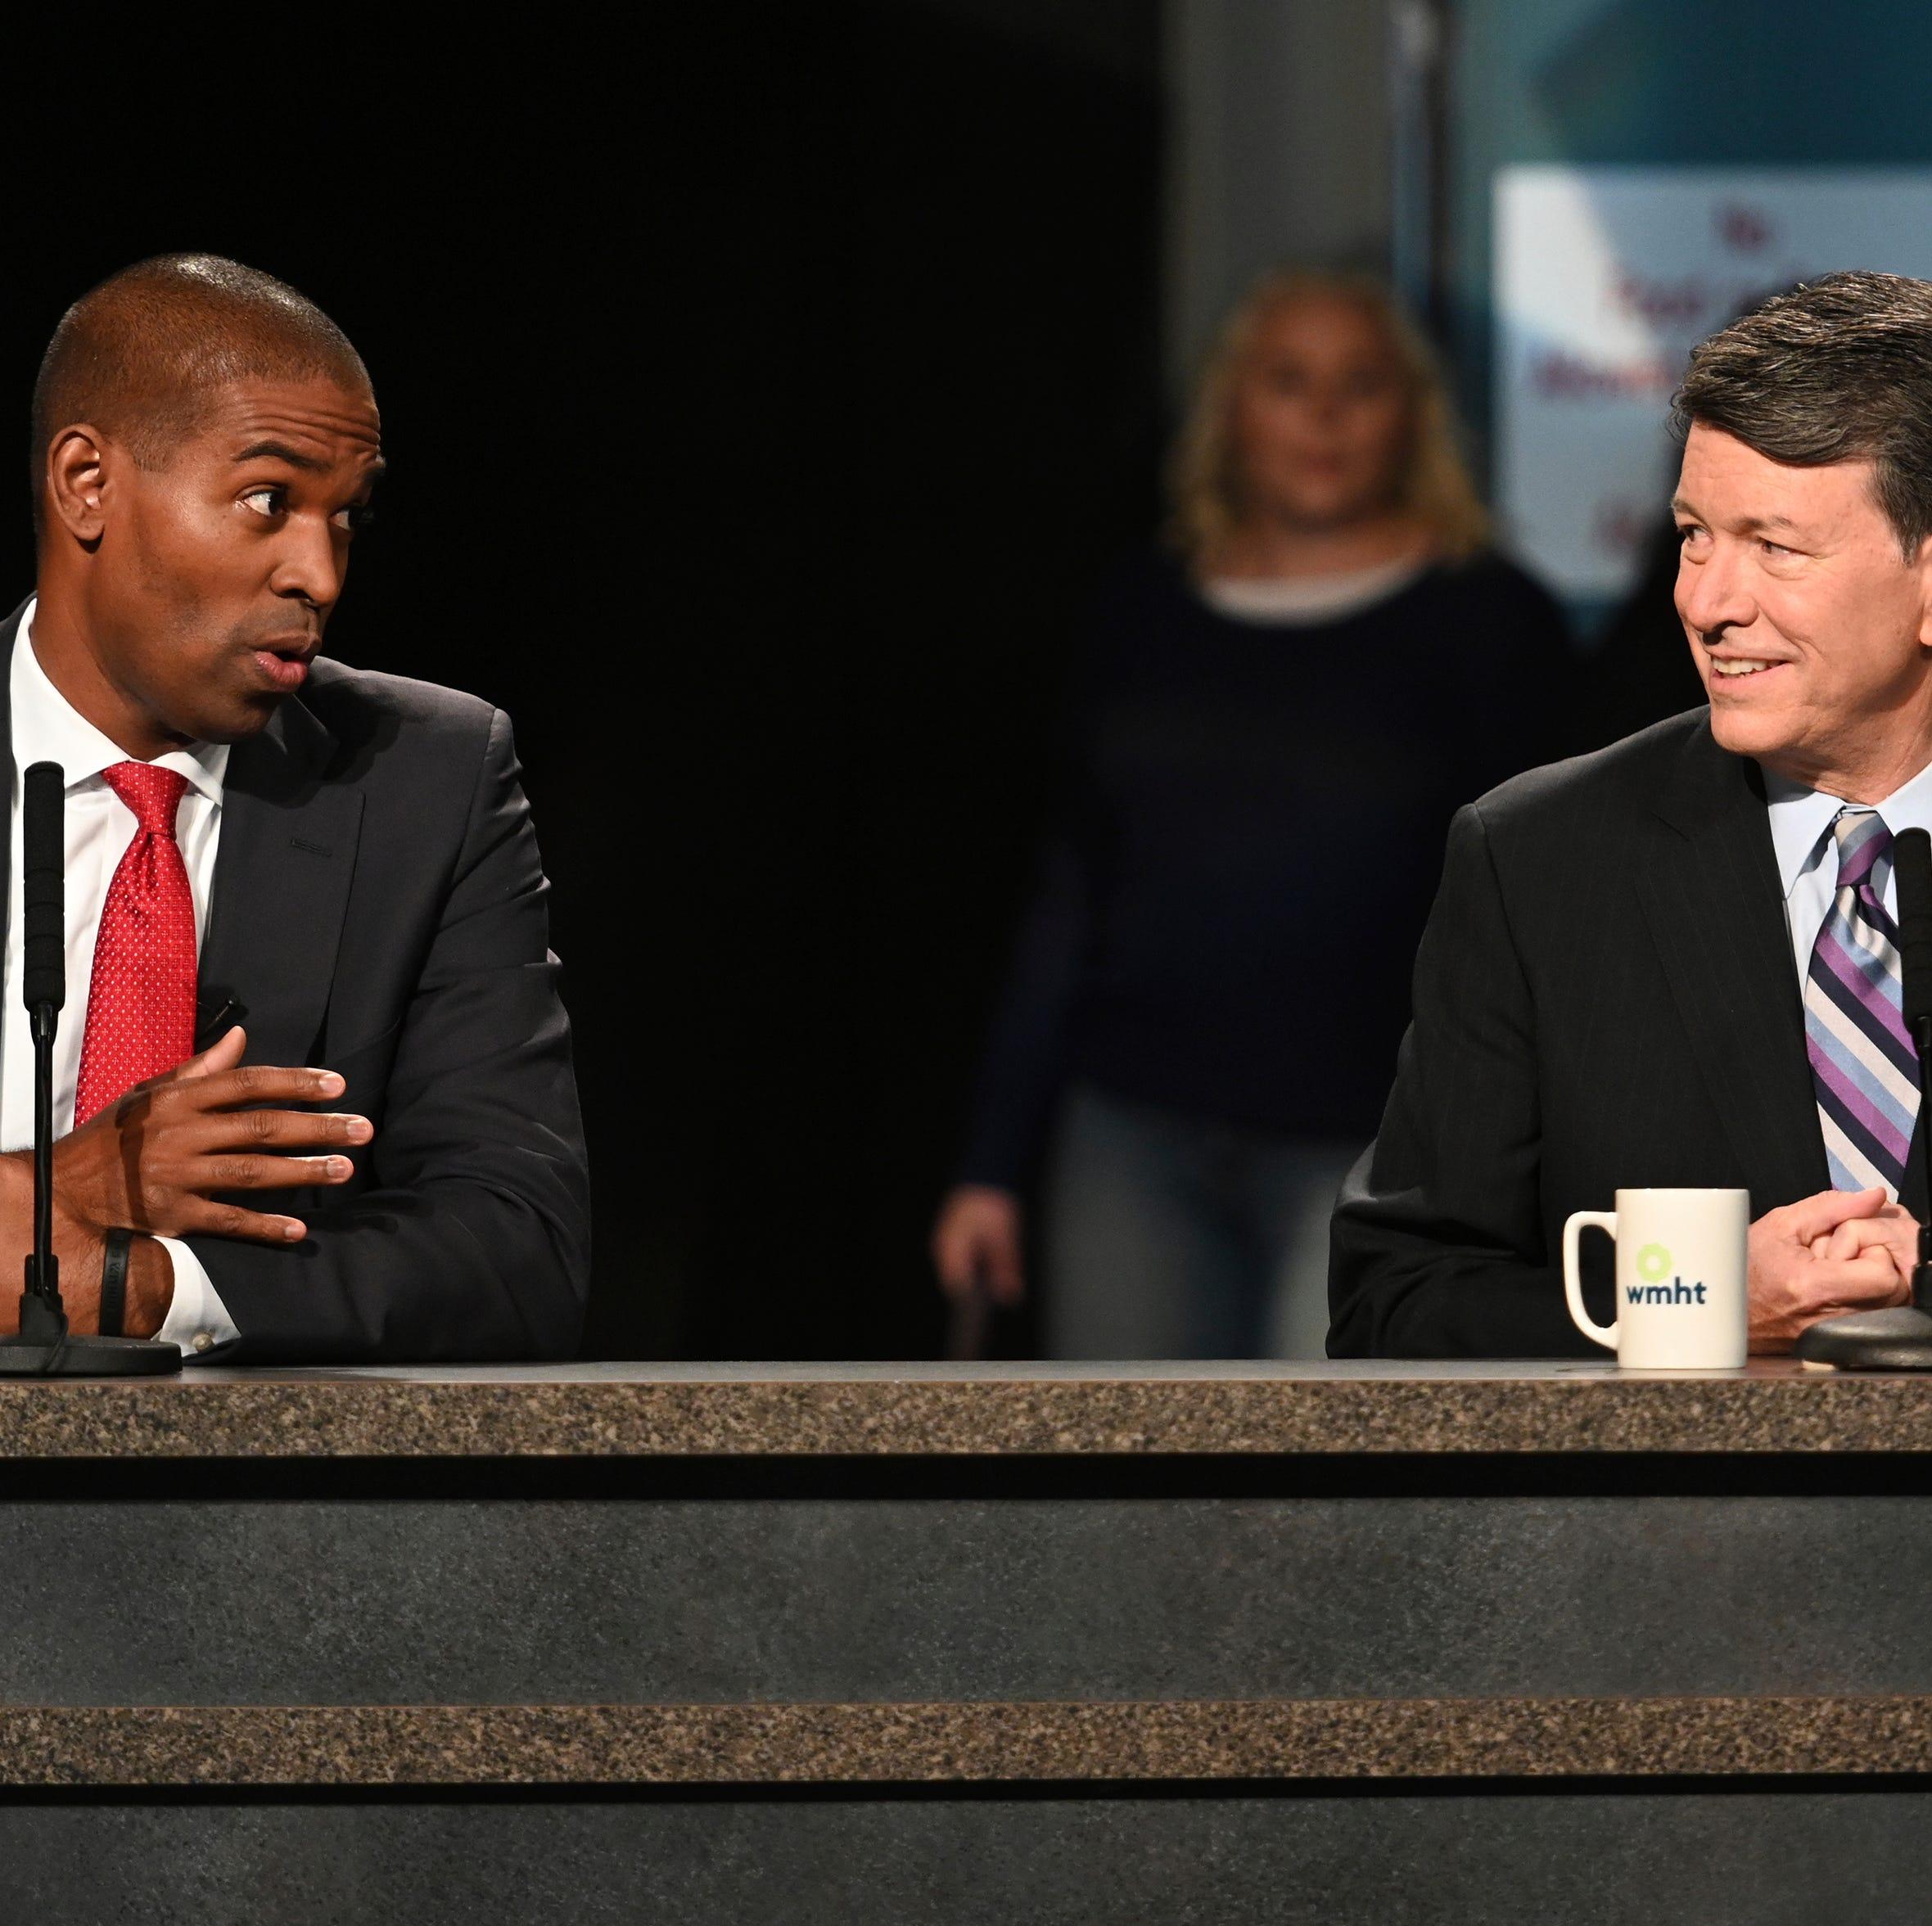 Faso, Delgado battle in first TV debate for critical House seat